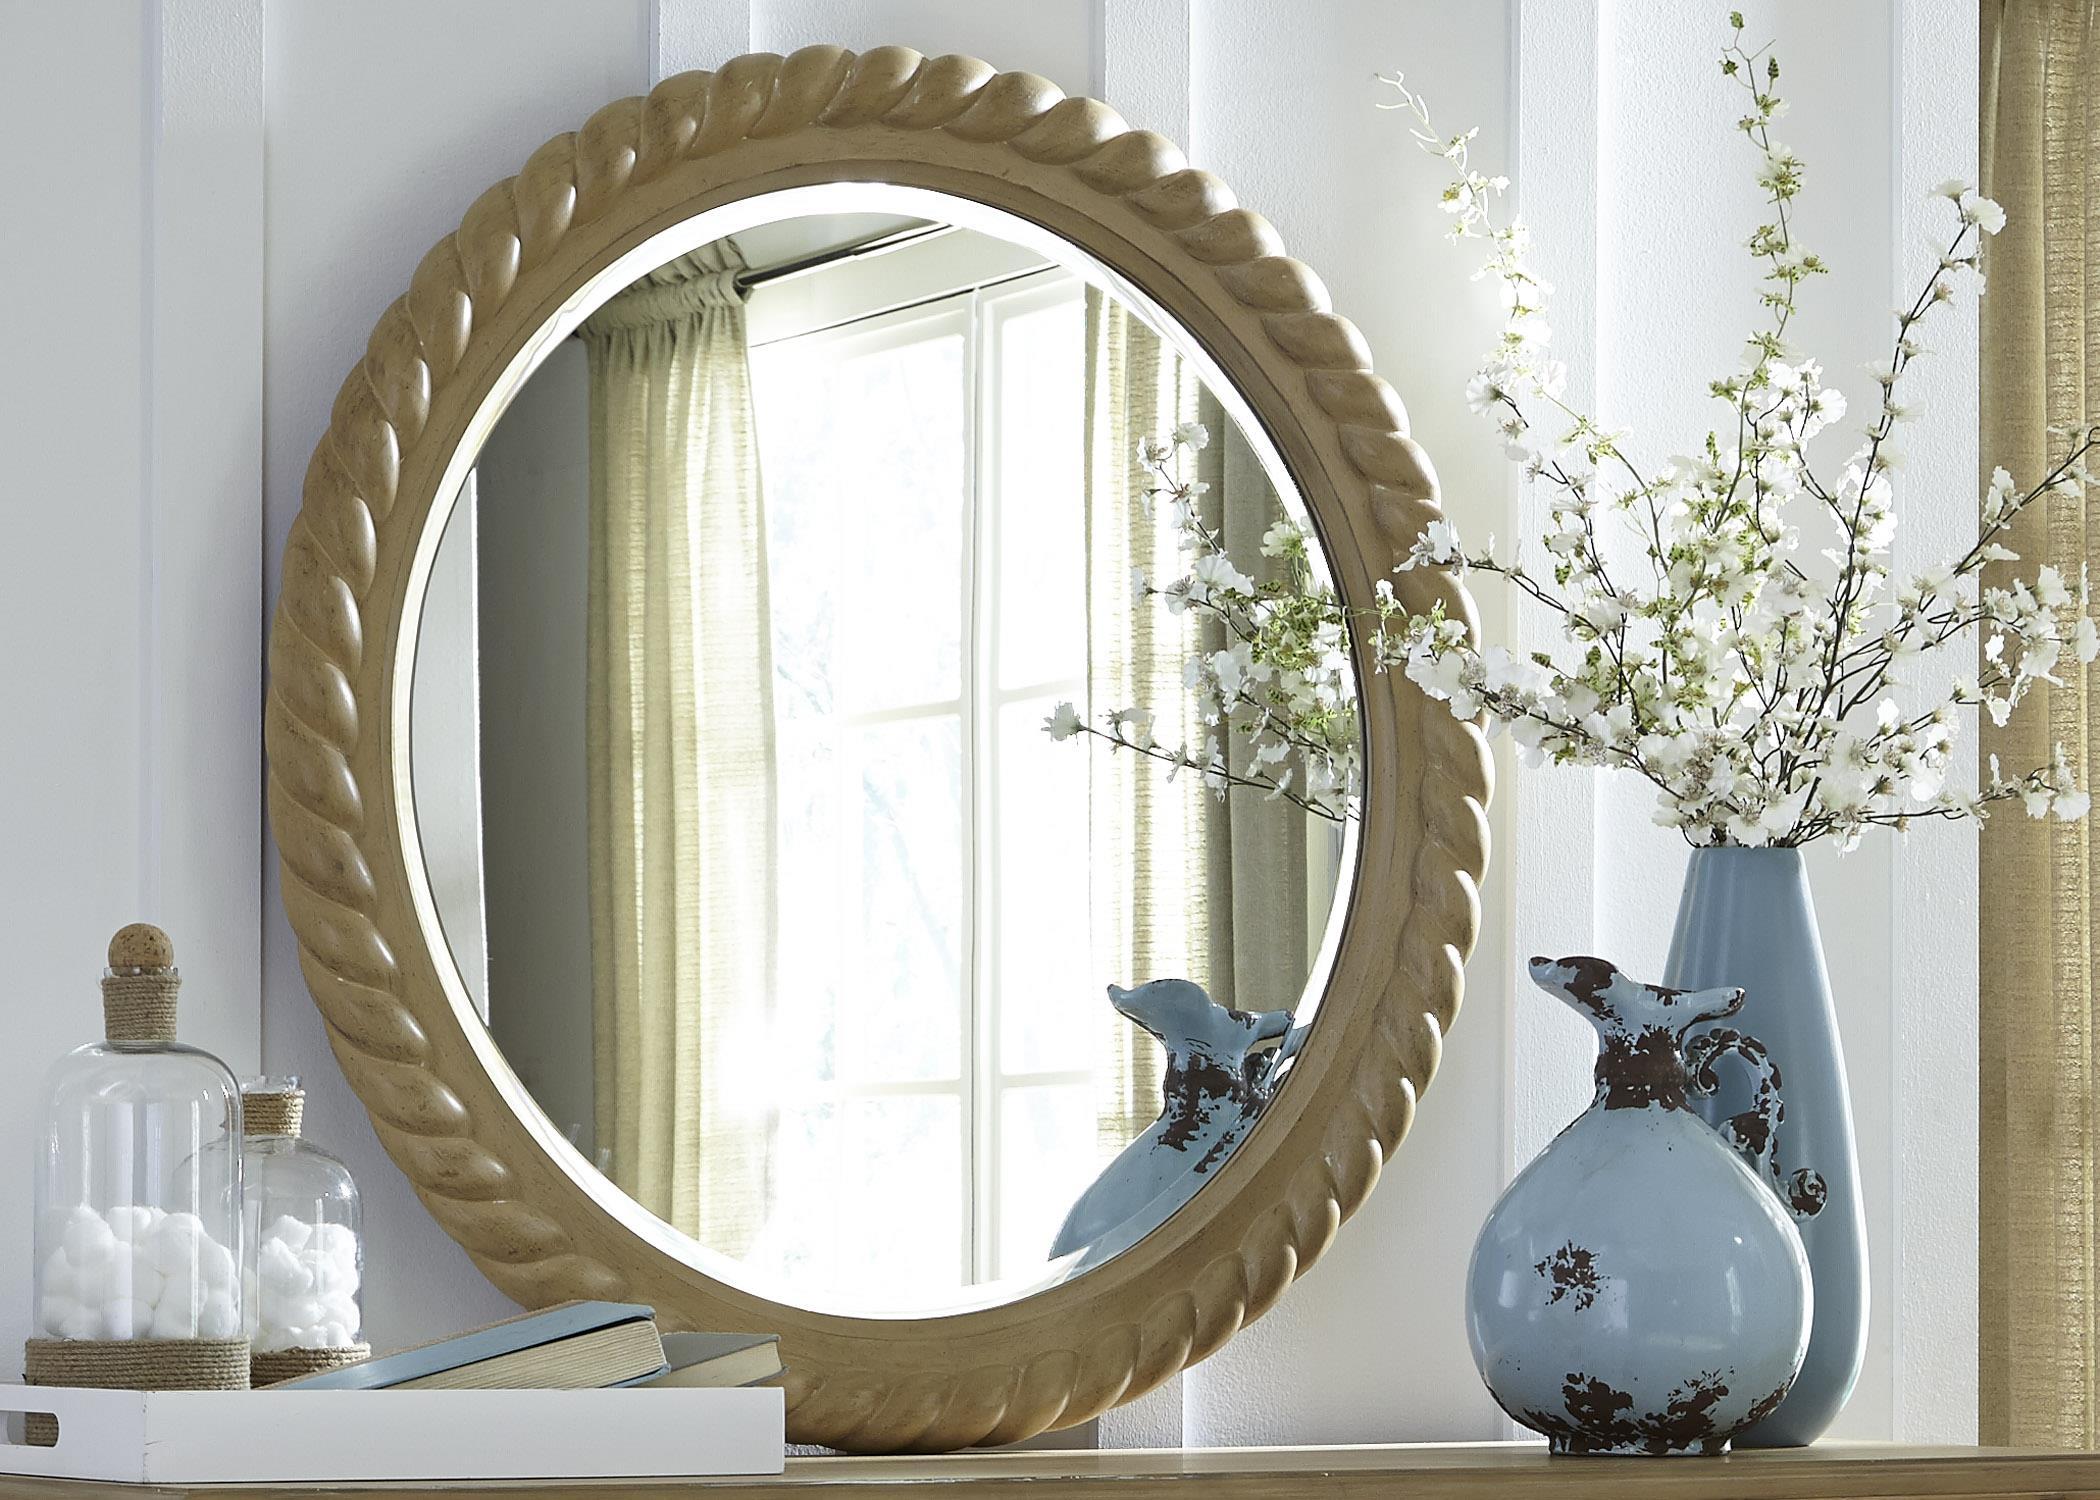 Liberty Furniture Harbor View Rope Mirror - Item Number: 531-BR52